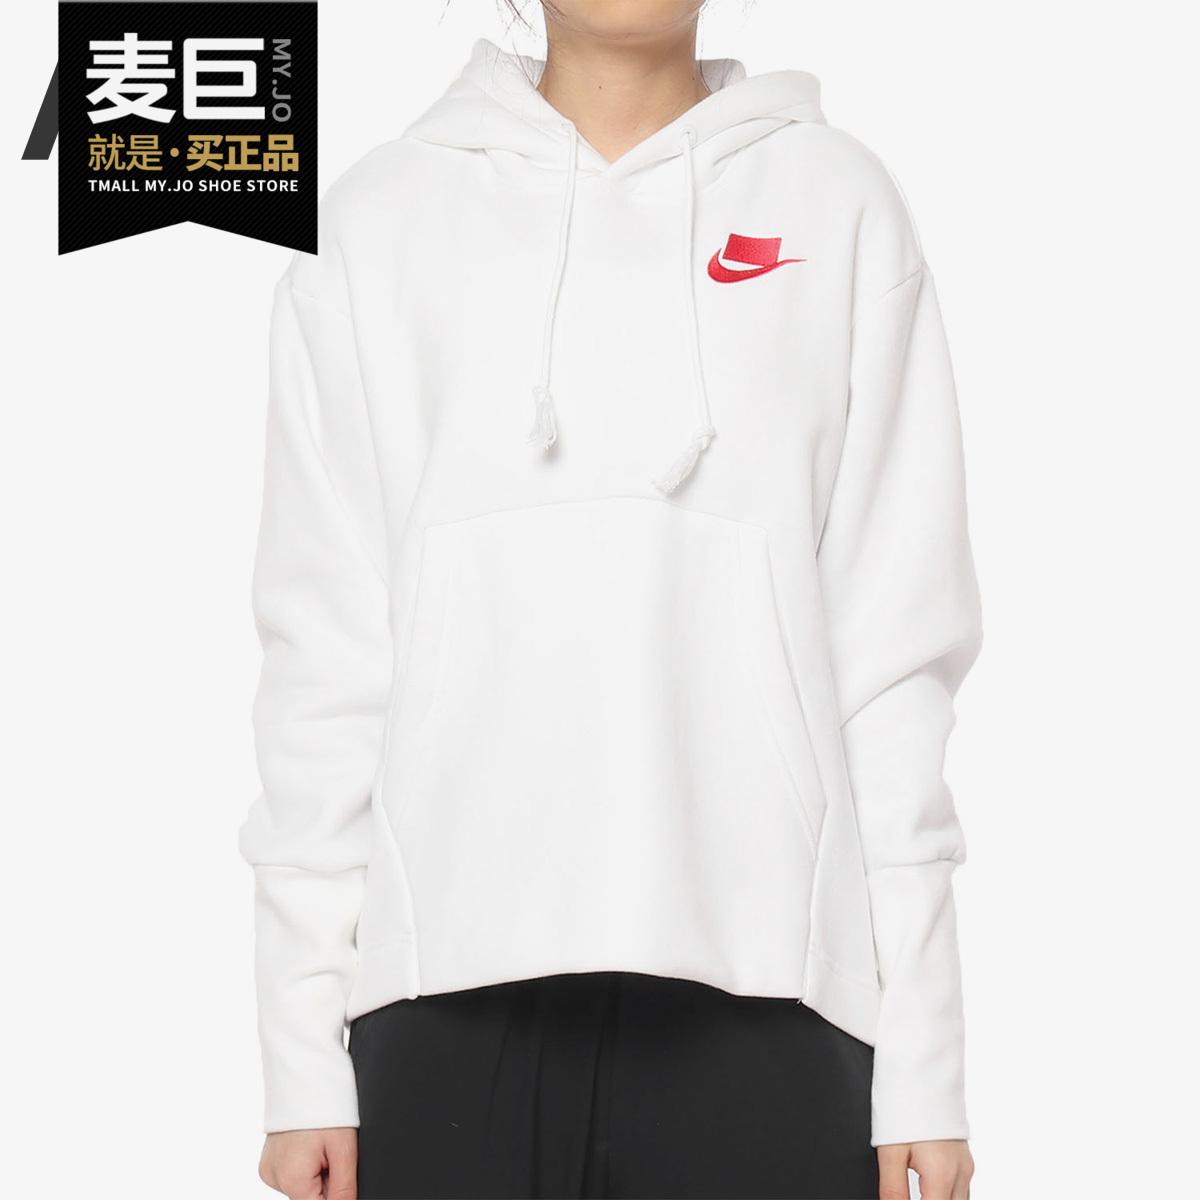 Nike/耐克正品 AS W NSW NSW HOODIE FLC 女子休闲运动卫衣AH8691